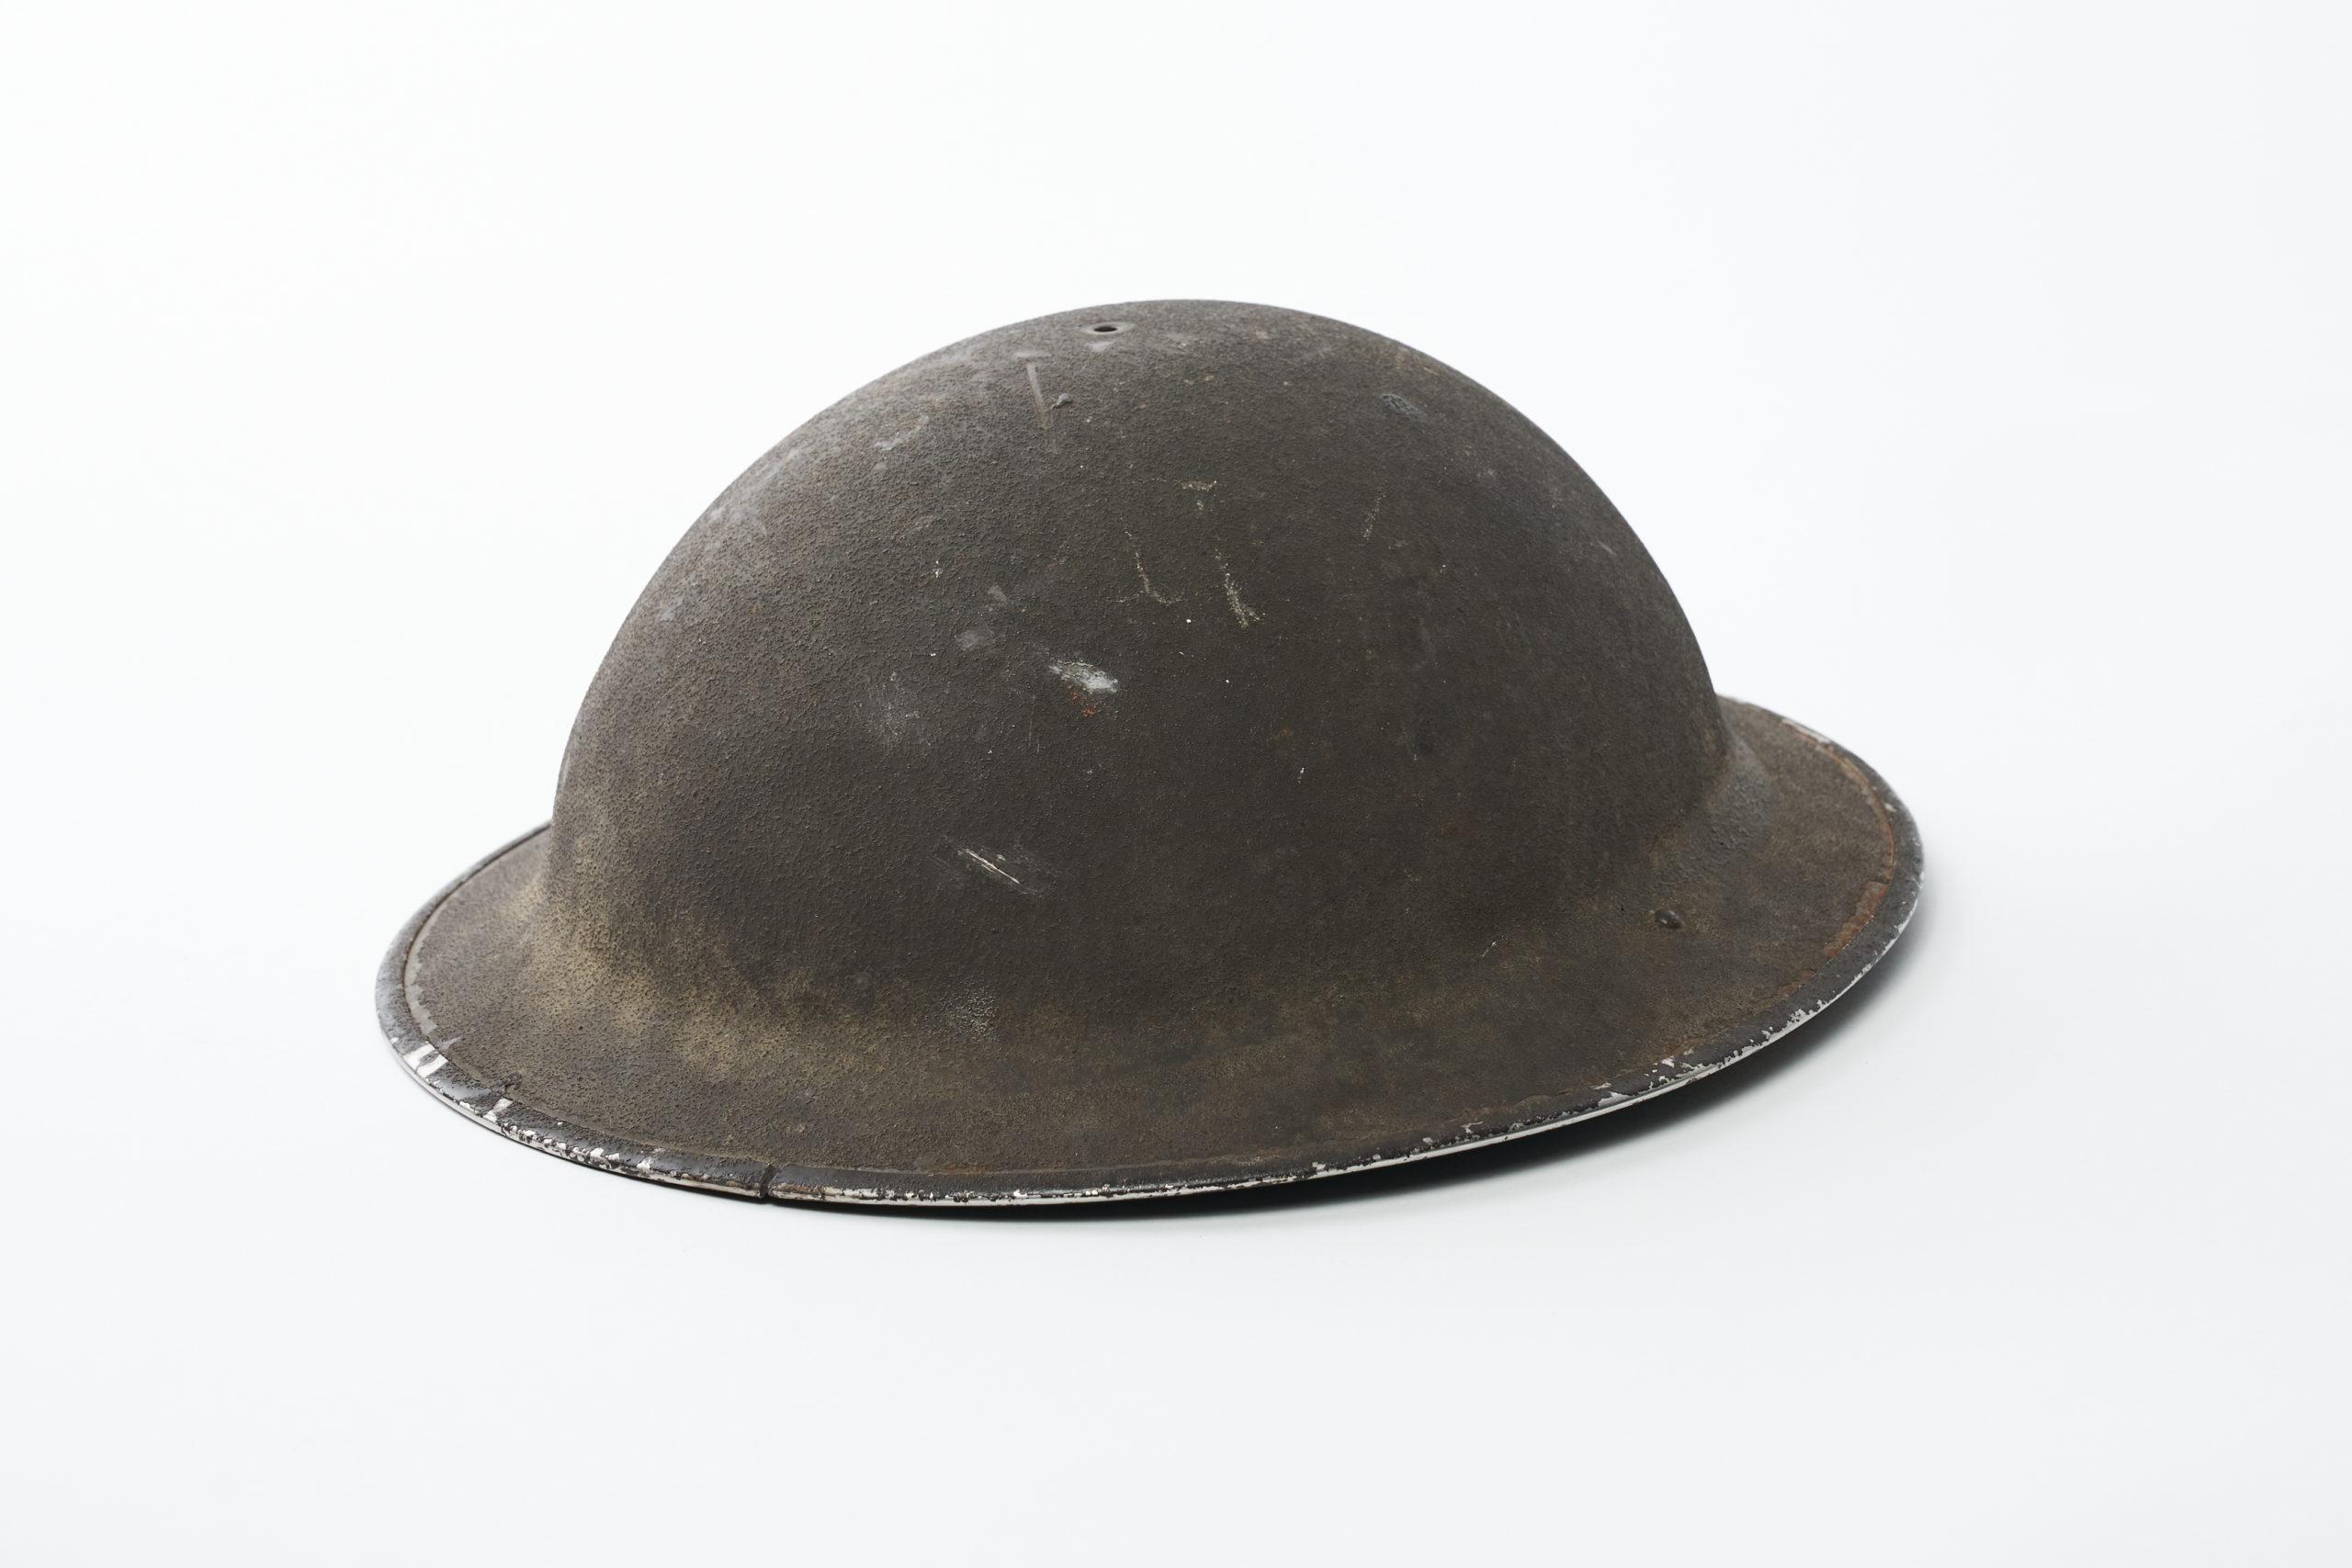 Mannifrank Brown's Second World War Helmet